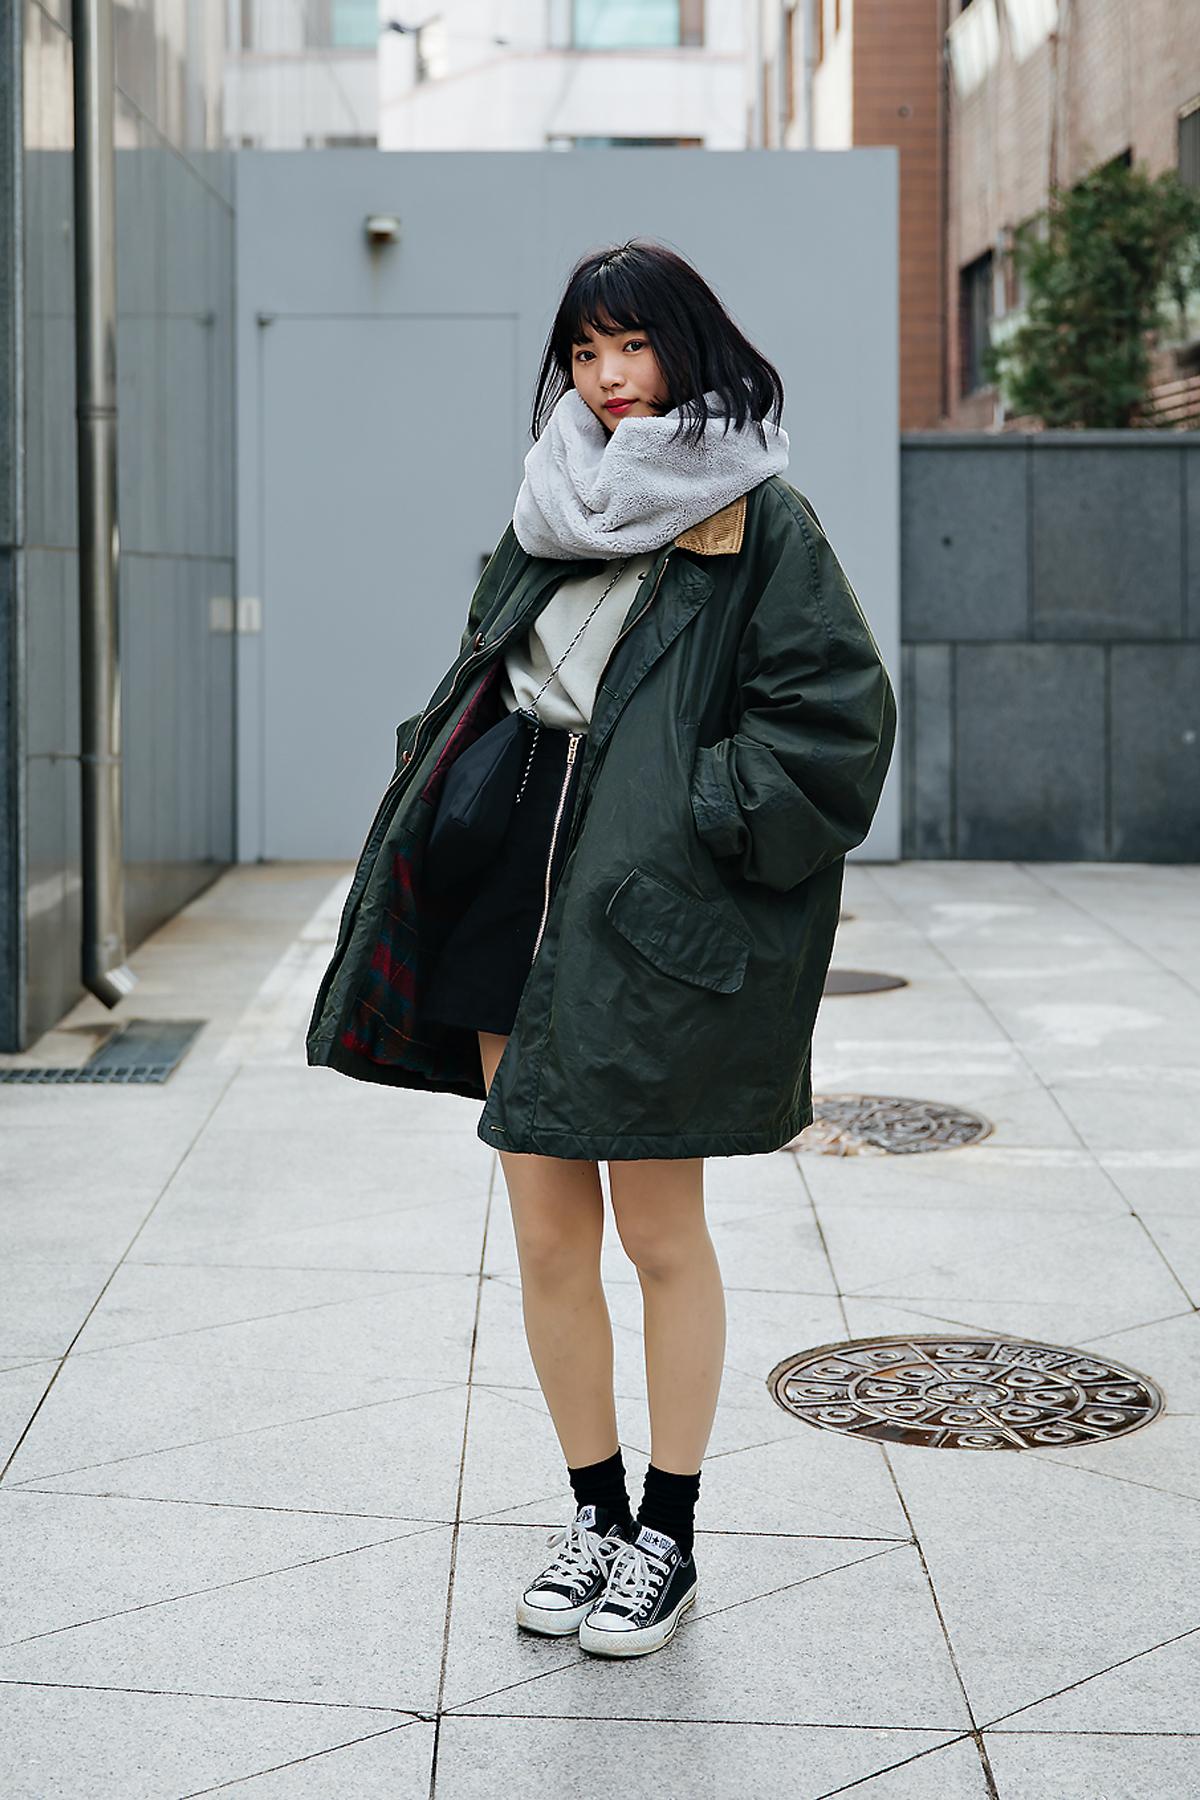 Manami Yamada, Street style women spring 2018 in seoul